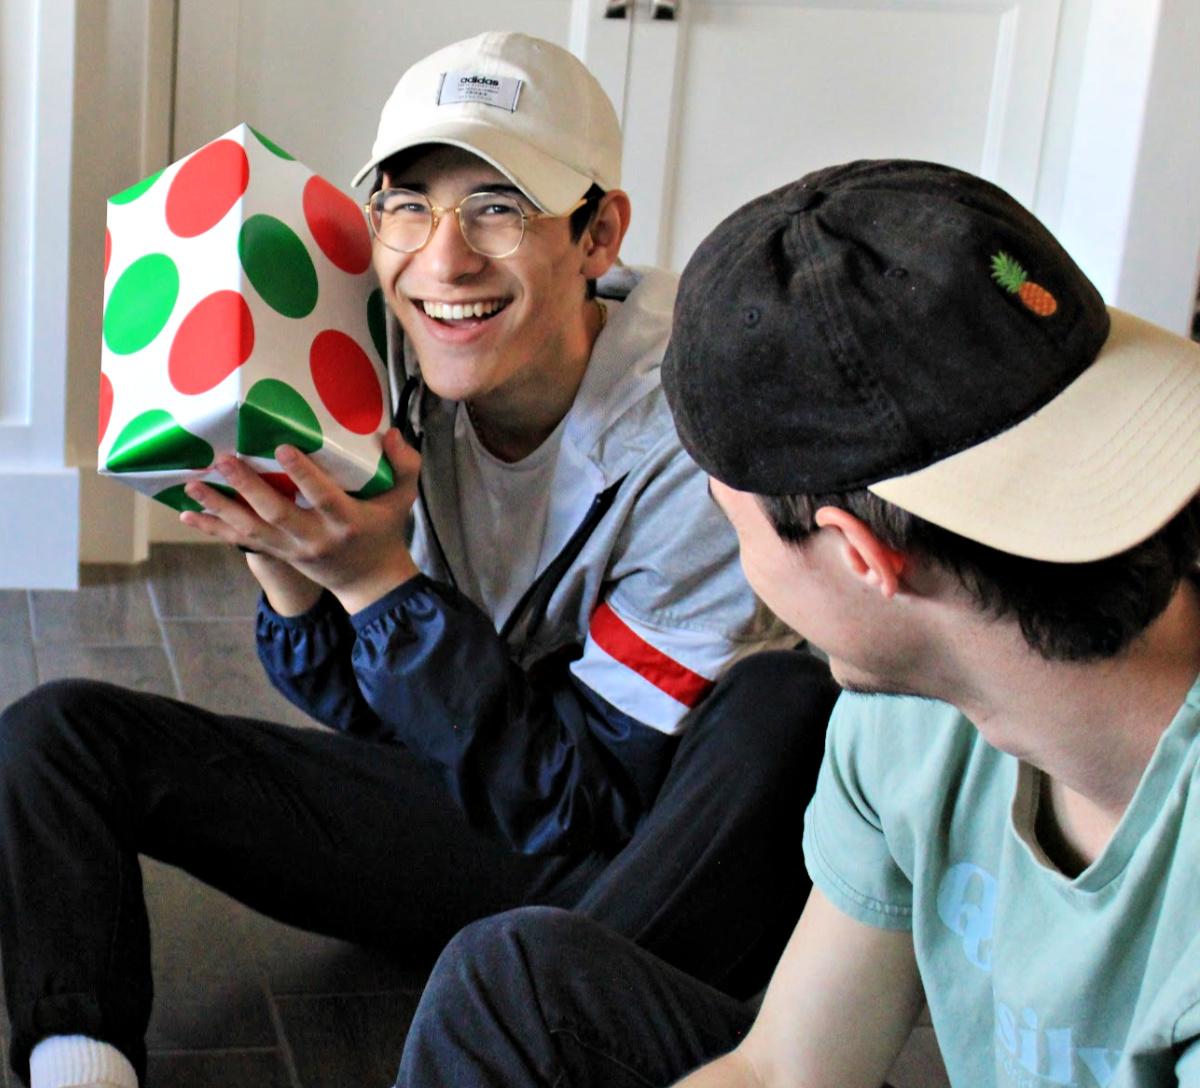 Fun Christmas Exchange Game